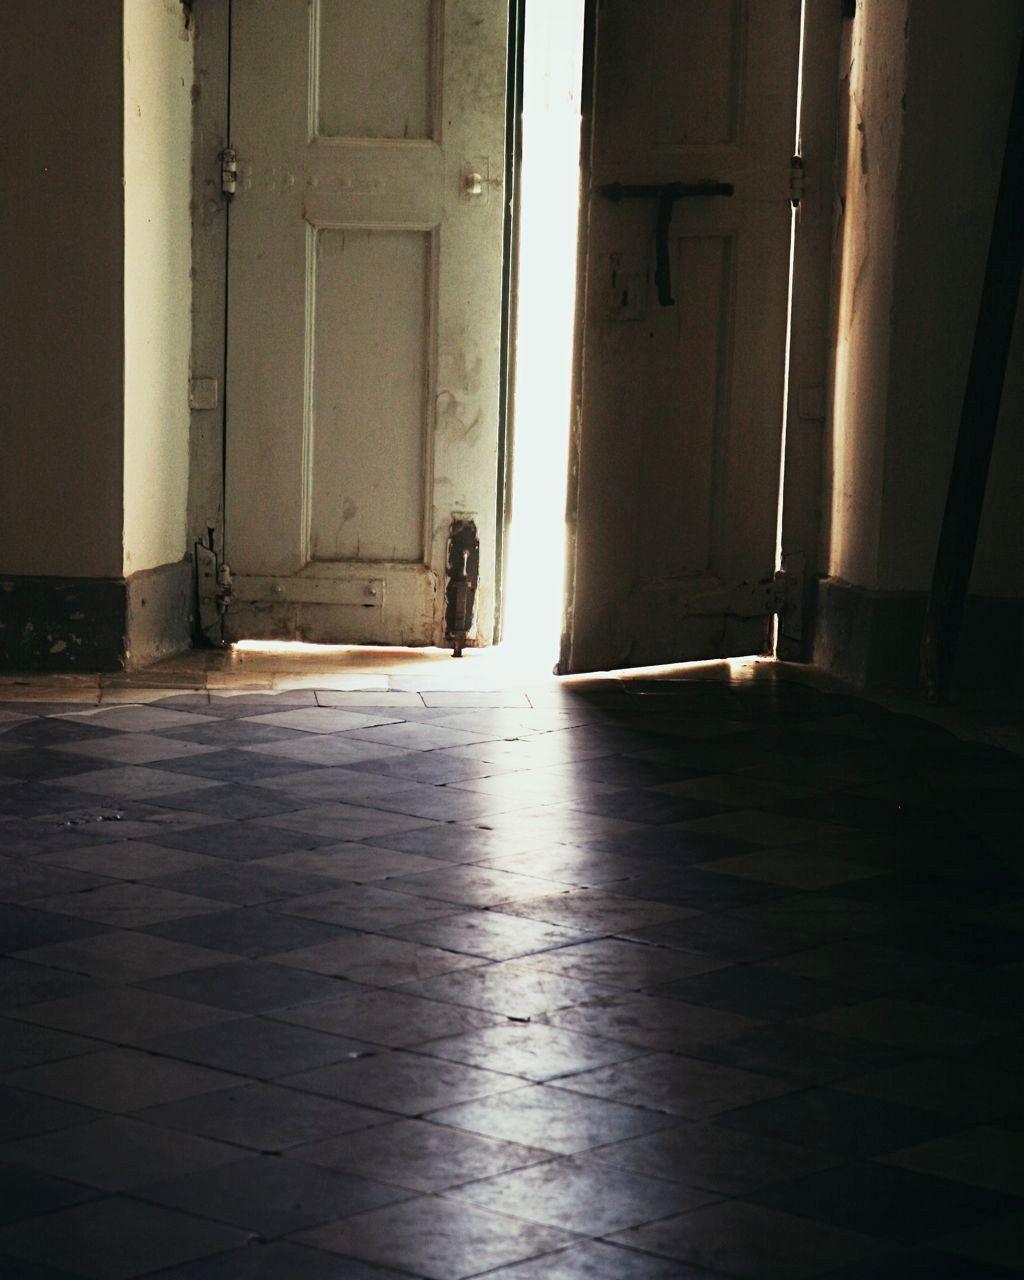 8 x 10 Photo - Dark Moody Mysterious Print - Behind the Door - Brazil Art Photo - Black Cream - Door Photography. via Etsy.